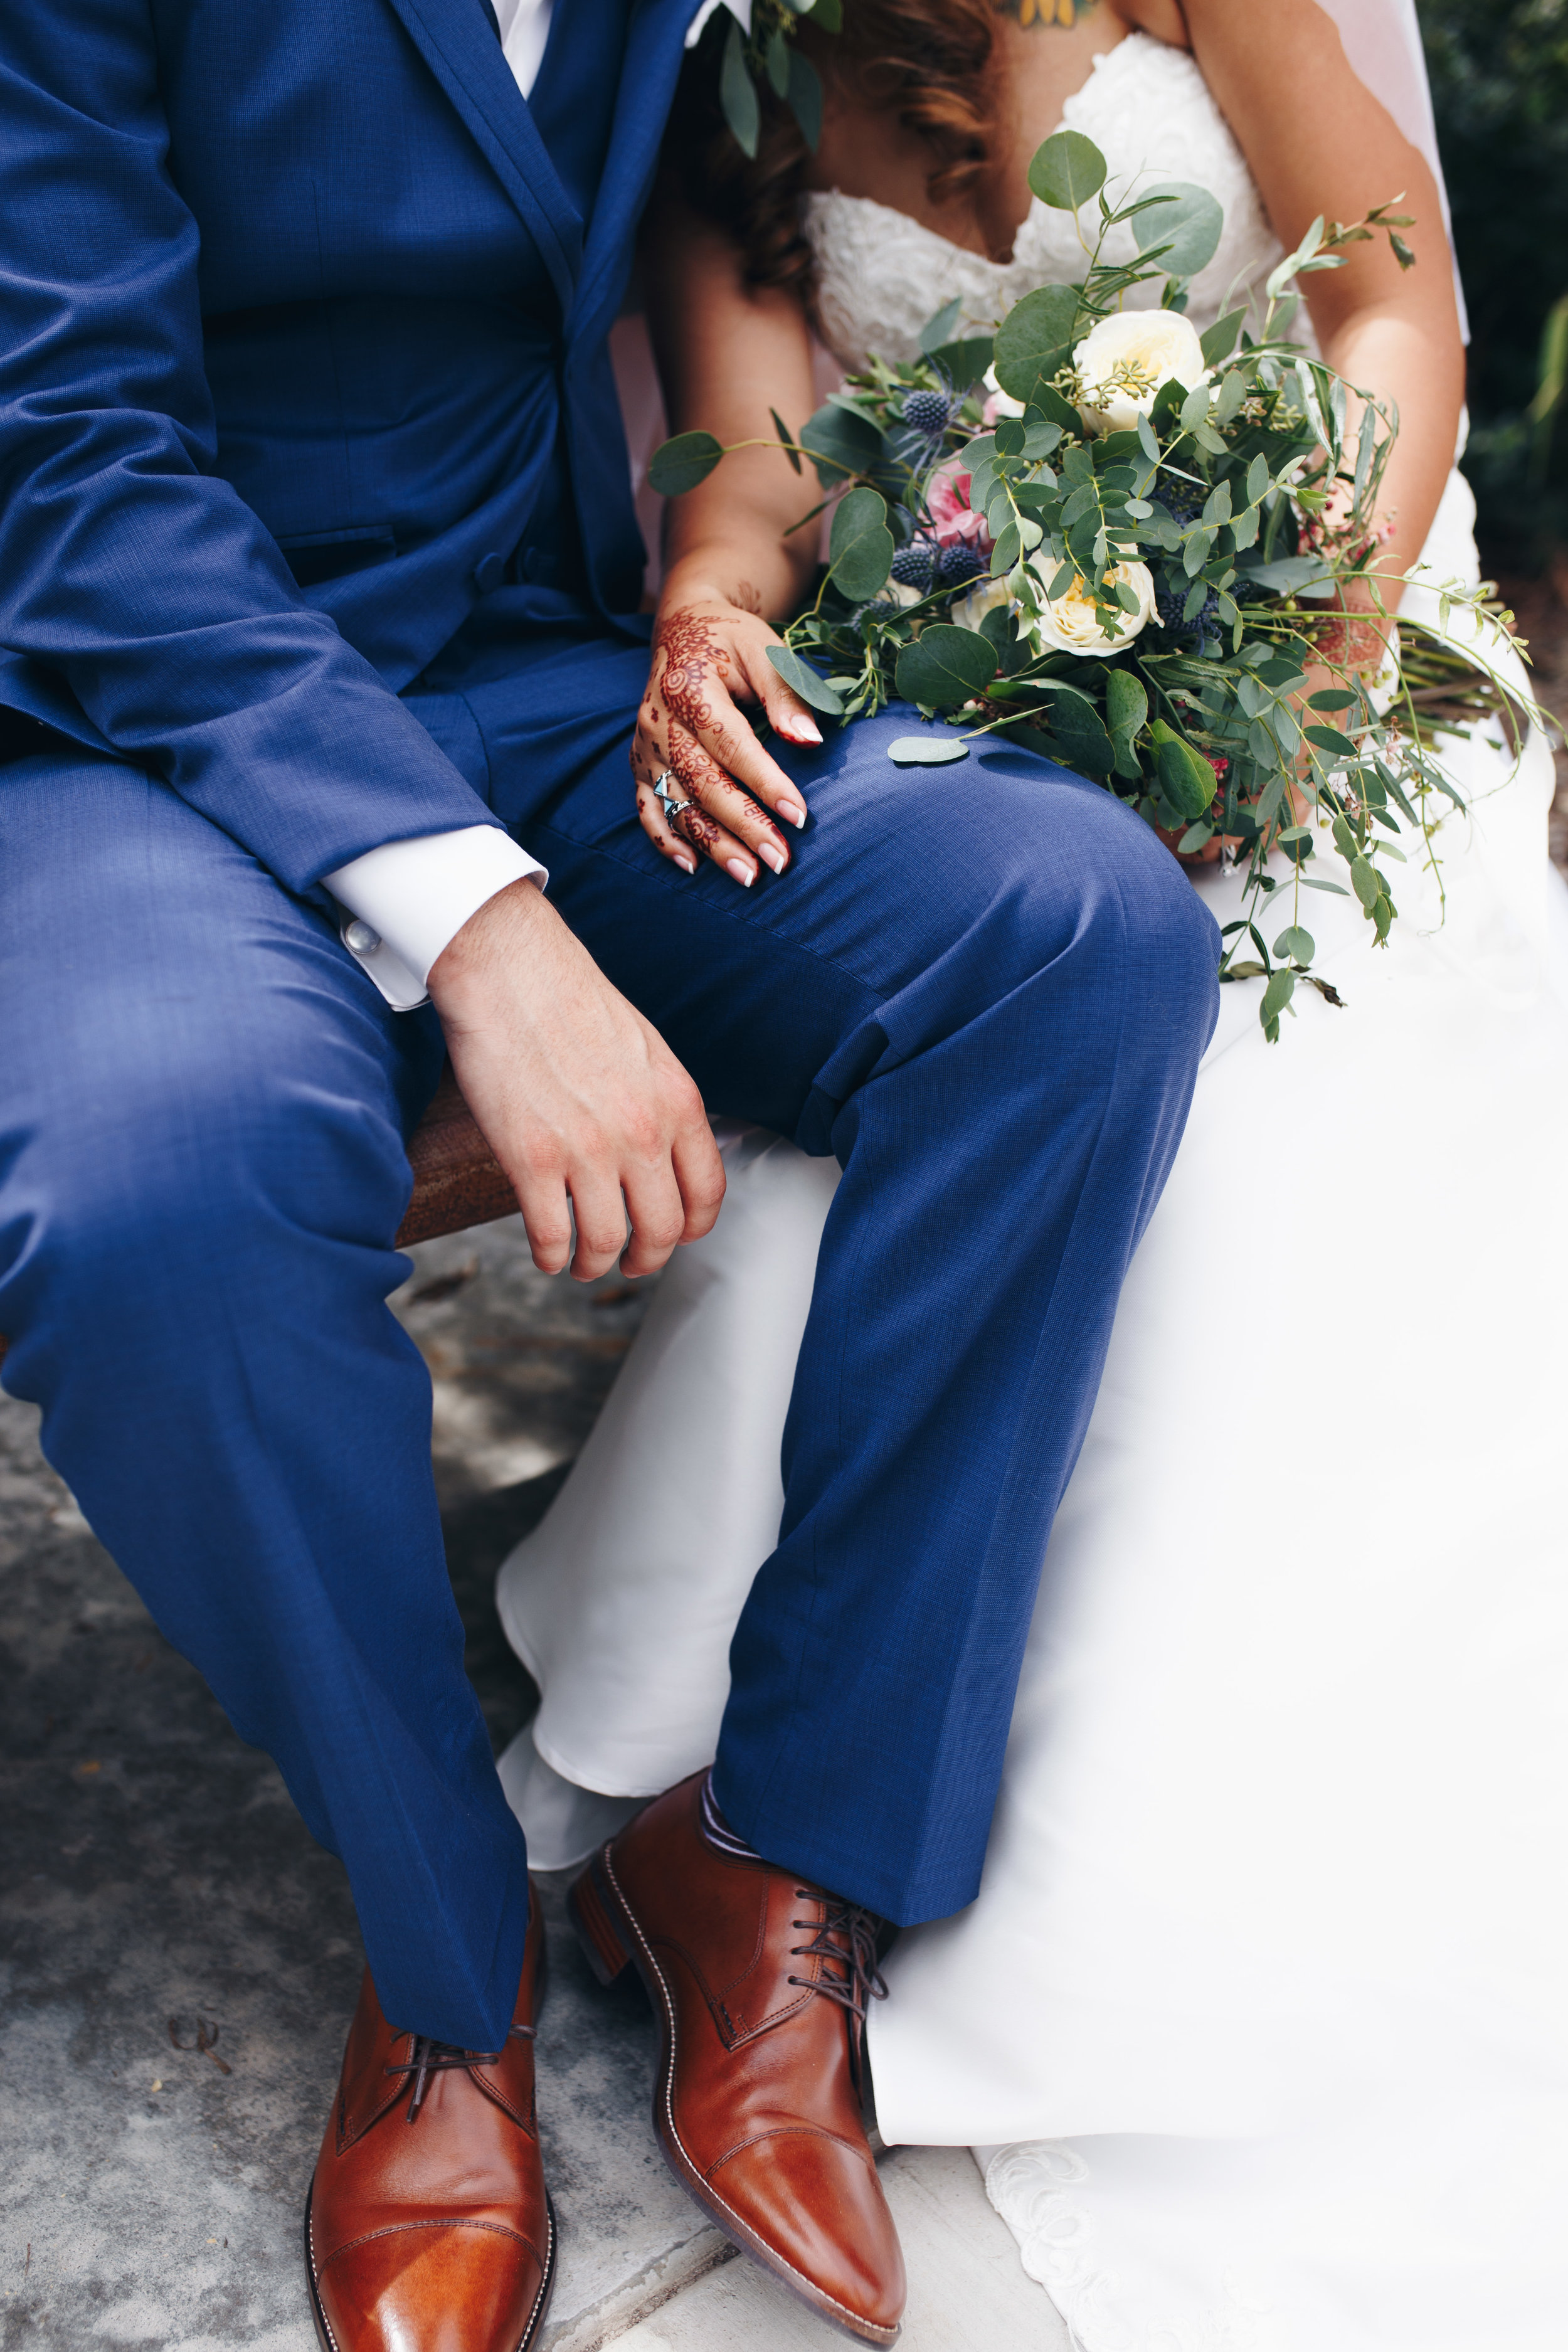 Veronica & Adrian Wedding 31 (1 of 1).jpg